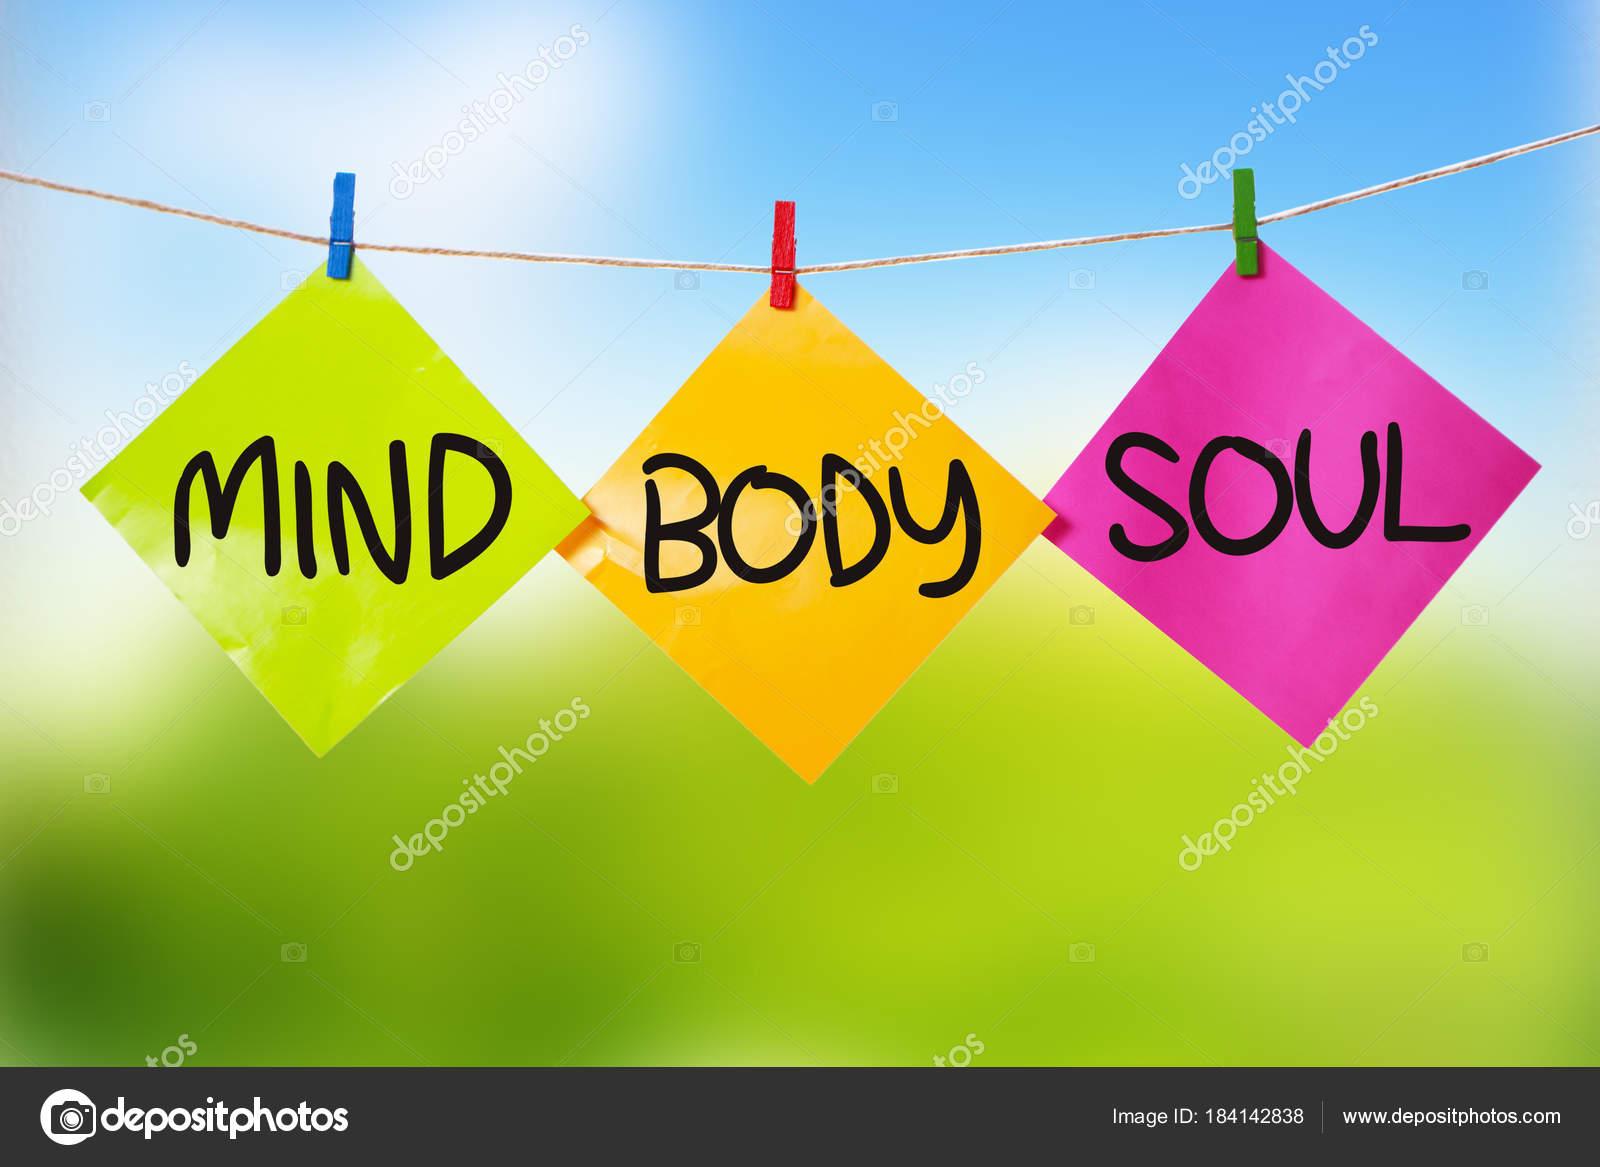 Geist Körper Seele Inspirierende Text Stockfoto Airdone